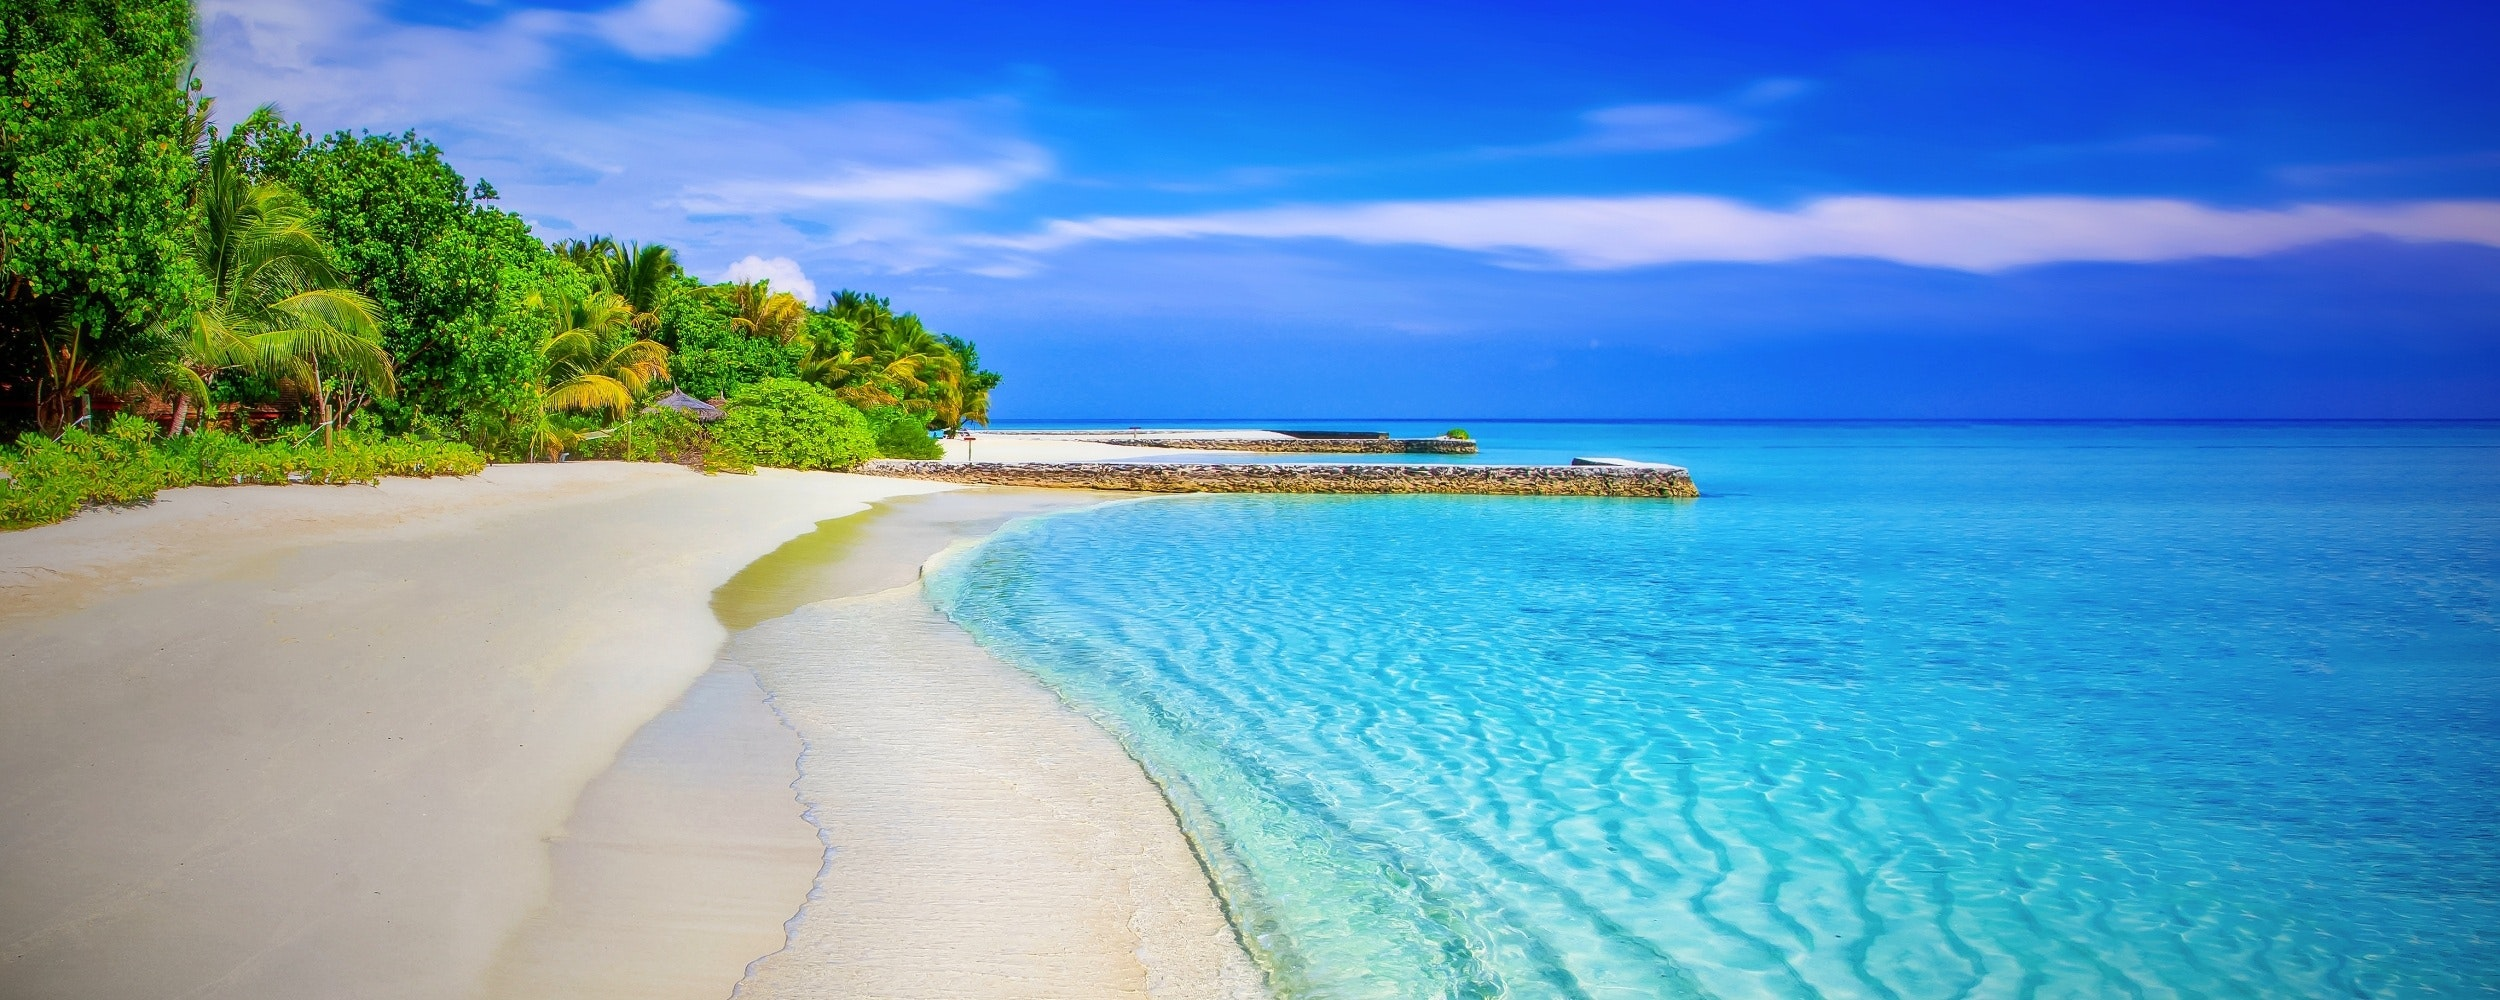 beach-exotic-holiday-248797